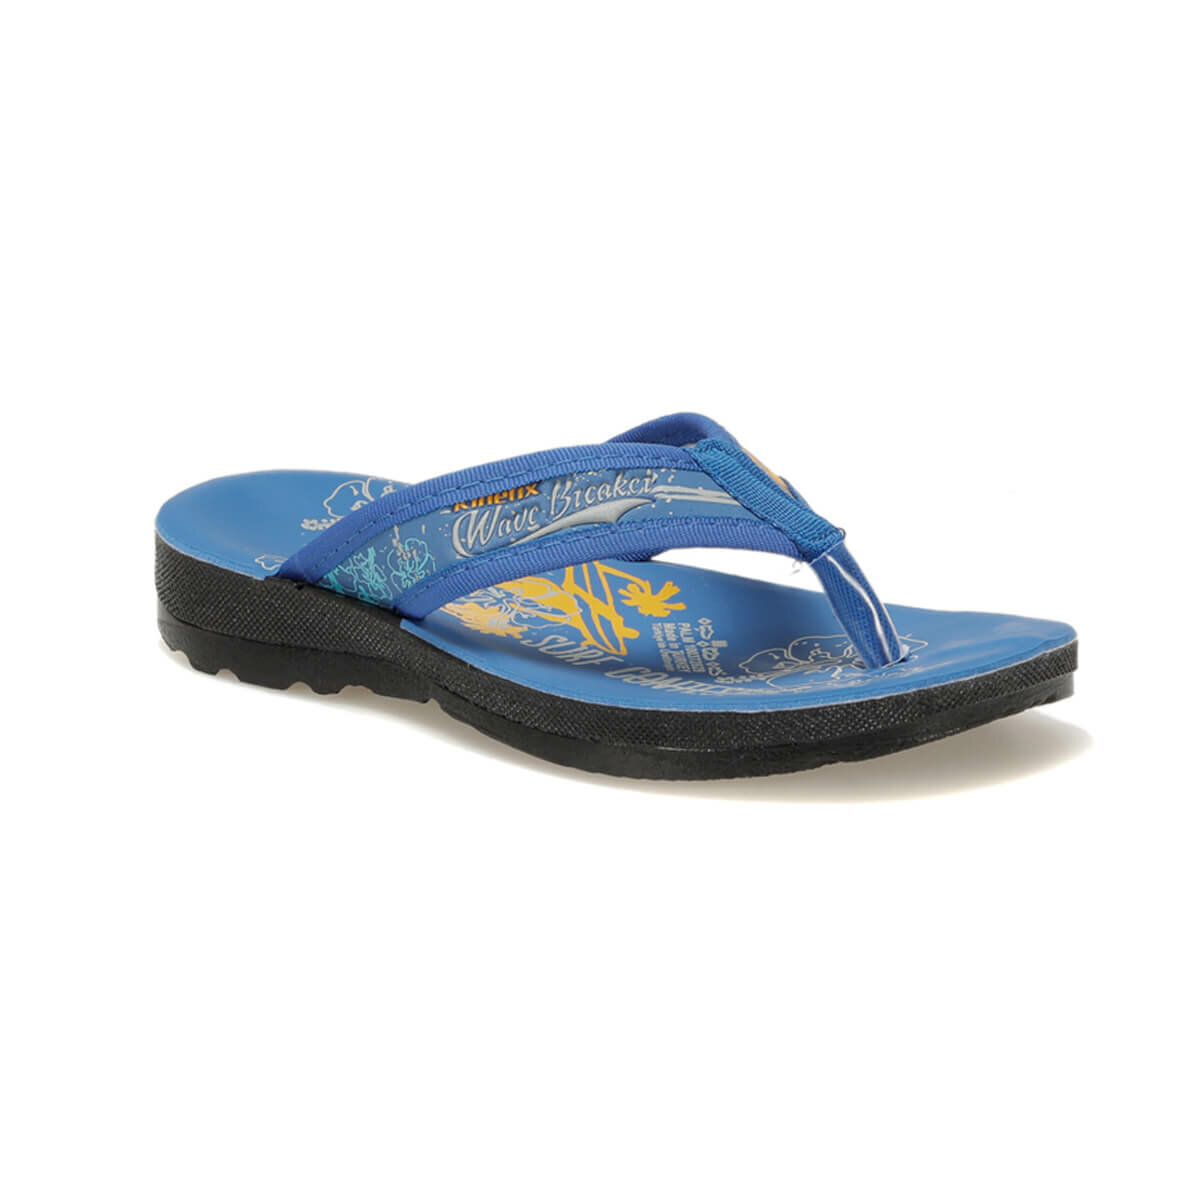 FLO PALM Saks Male Child Slippers KINETIX